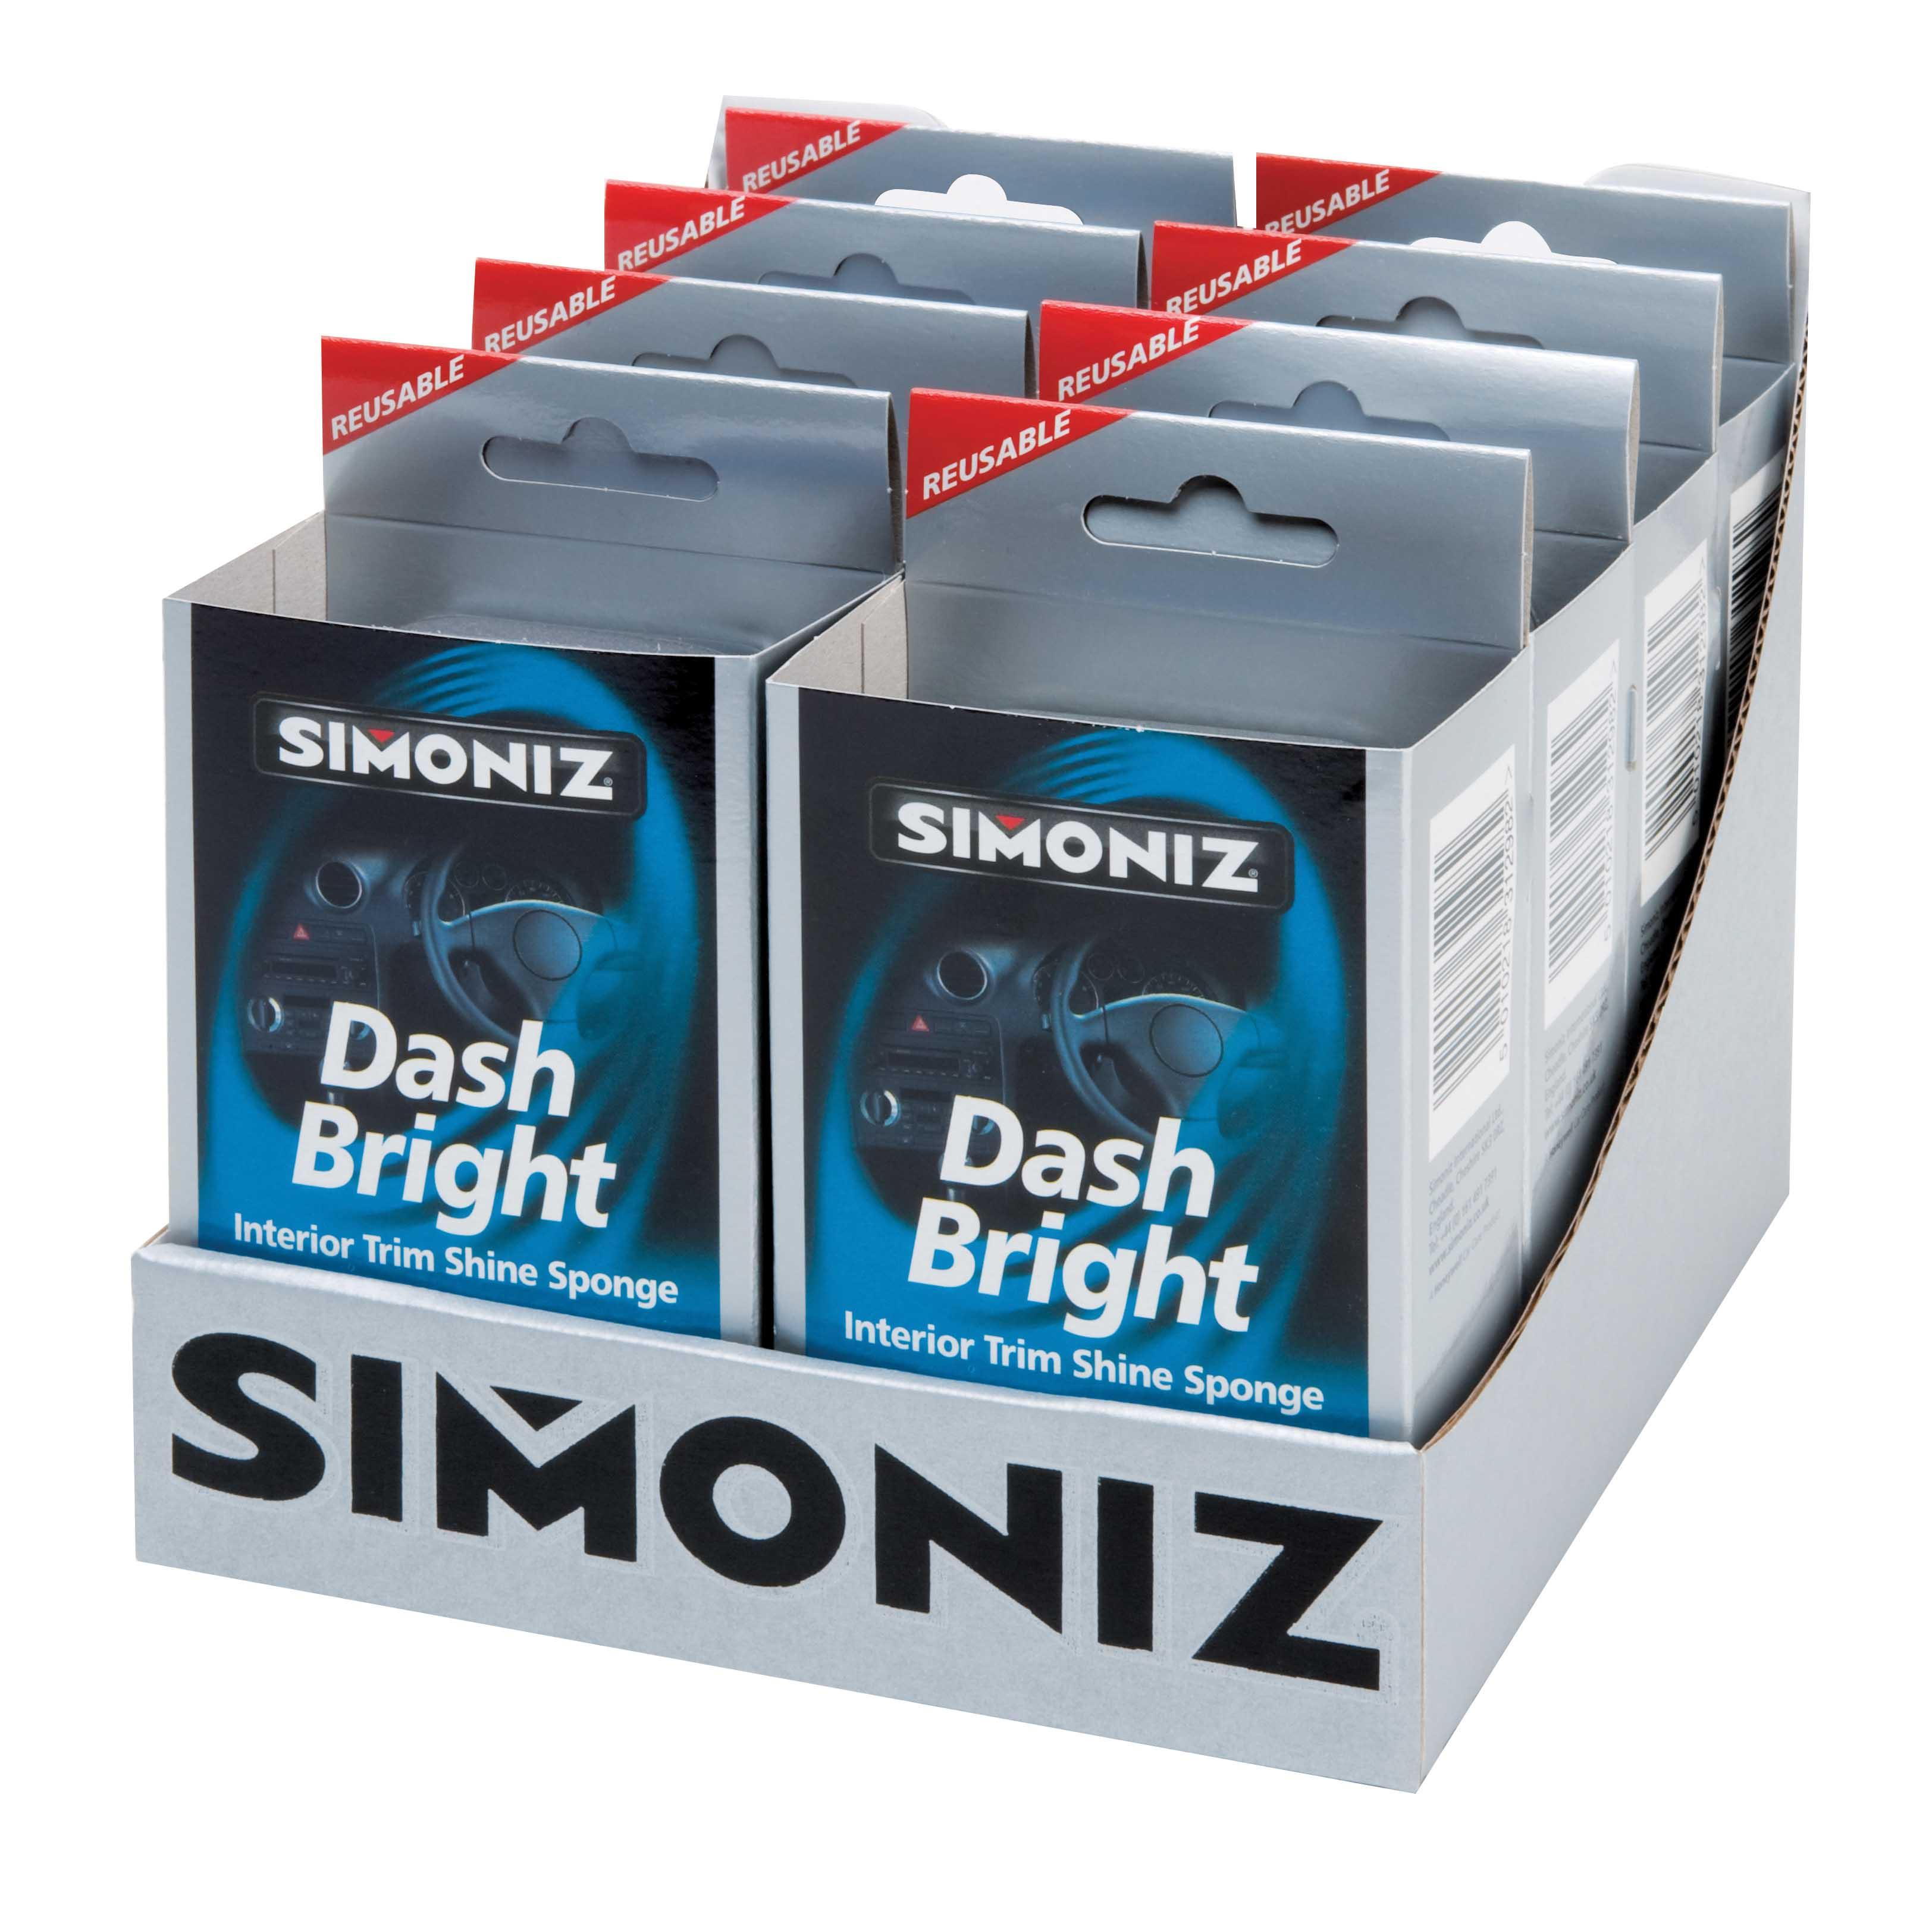 simoniz dash bright car interior trim shine sponge cleaner sdb1. Black Bedroom Furniture Sets. Home Design Ideas